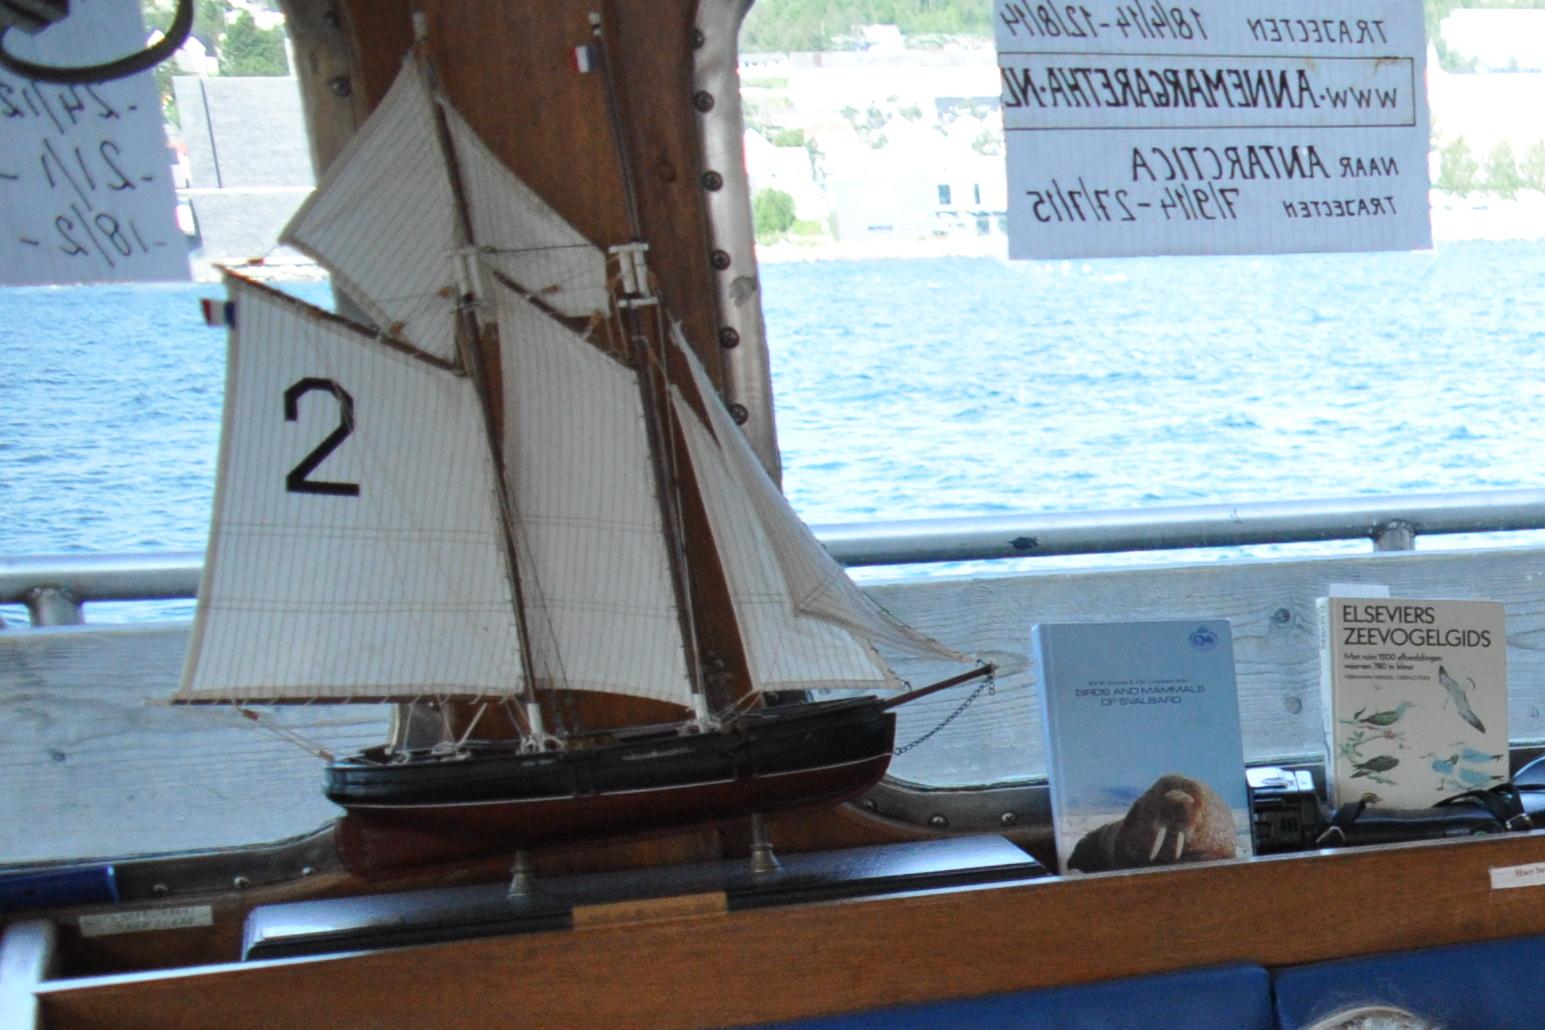 1. Preis Anne-Margaretha Race of the Classics